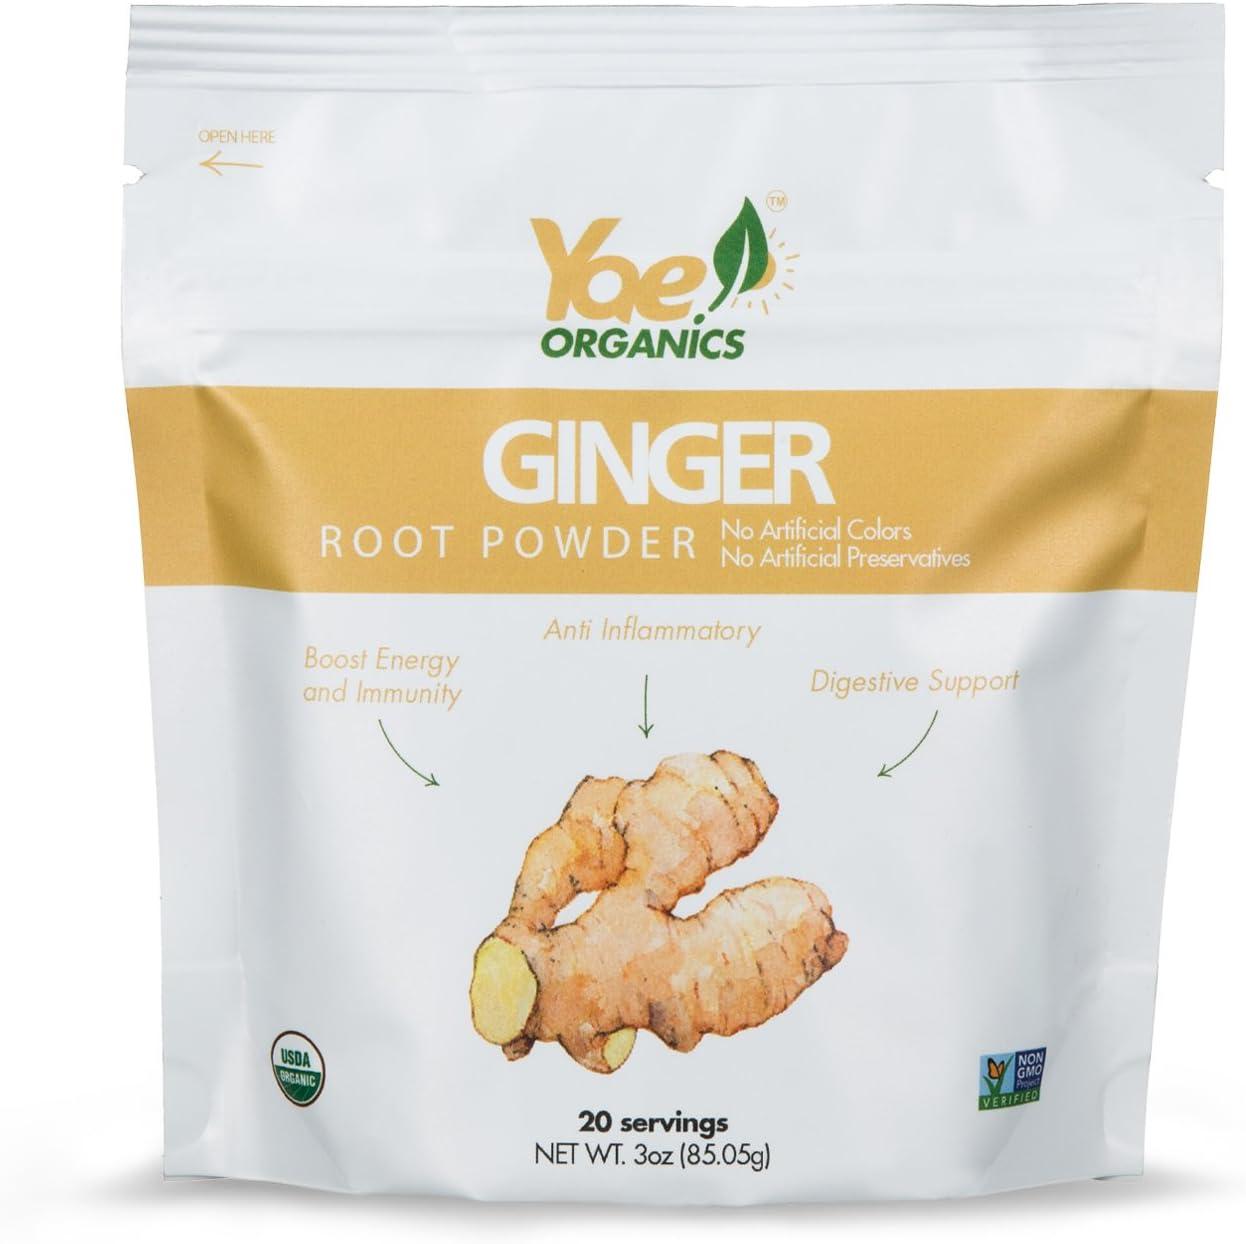 Yae! Organics Organic Keto Ginger Root Powder, 100% Pure Antioxidant Superfood Immunity Boost Gluten Free Non GMO, No Artificial Additives, Preservatives and Sugar (3oz/20 Servings)